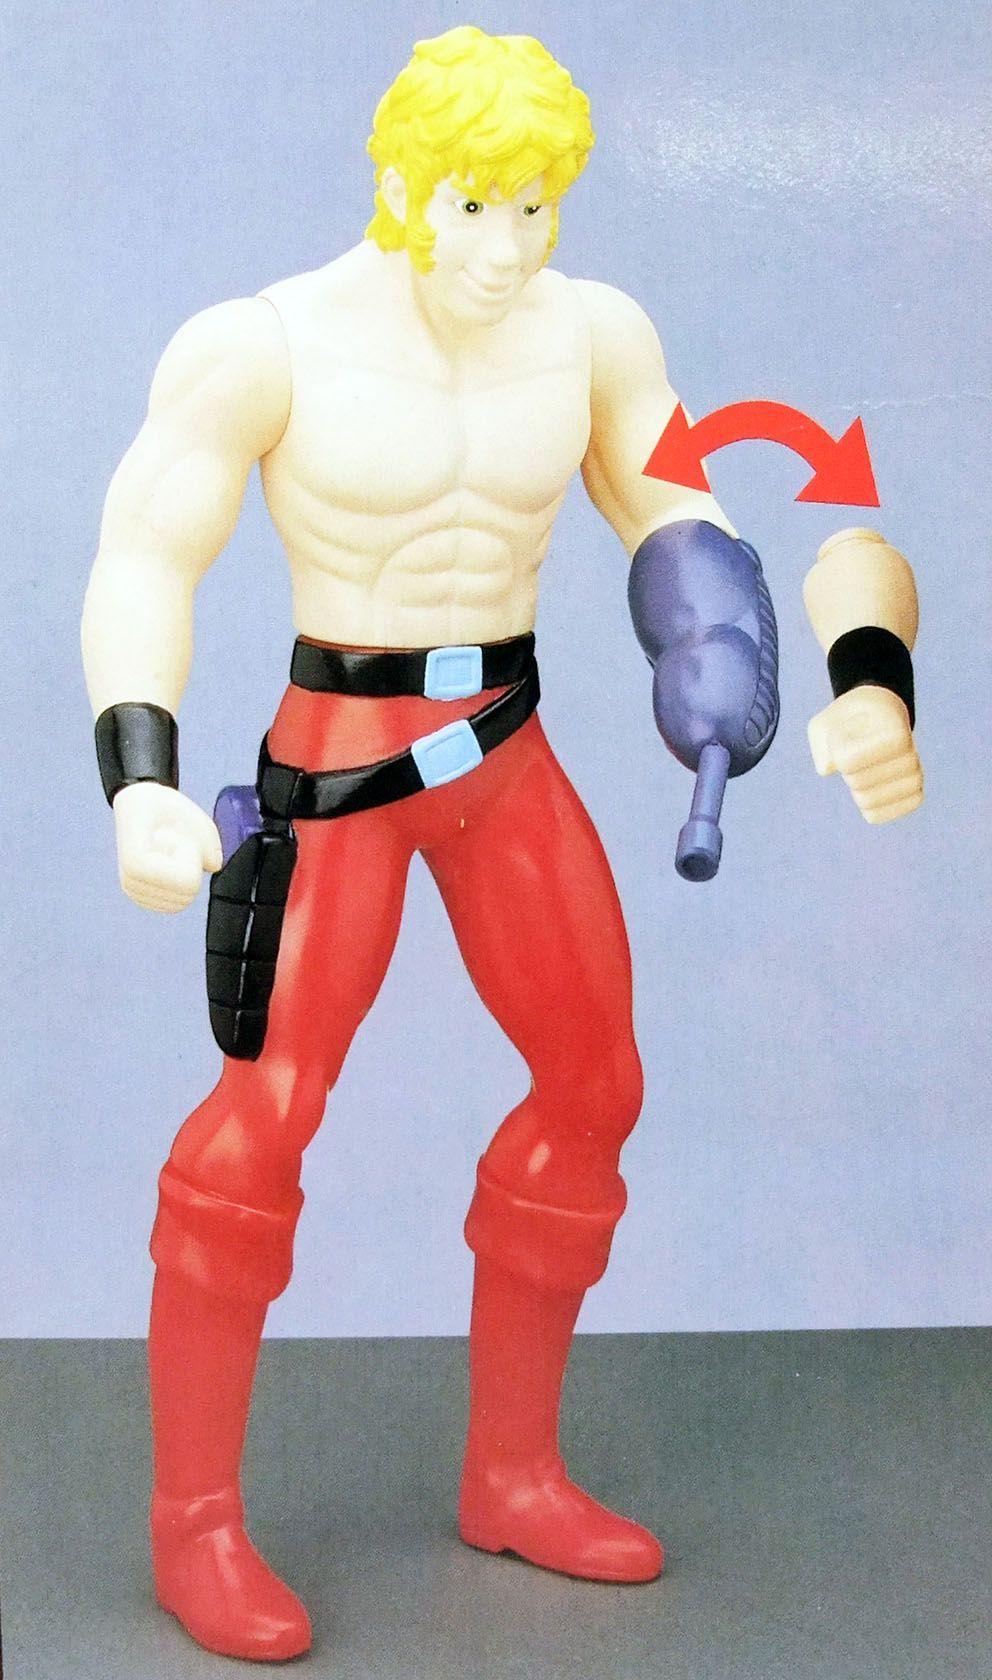 Space Adventures Cobra - AB Toys - Cobra Jumbo figure